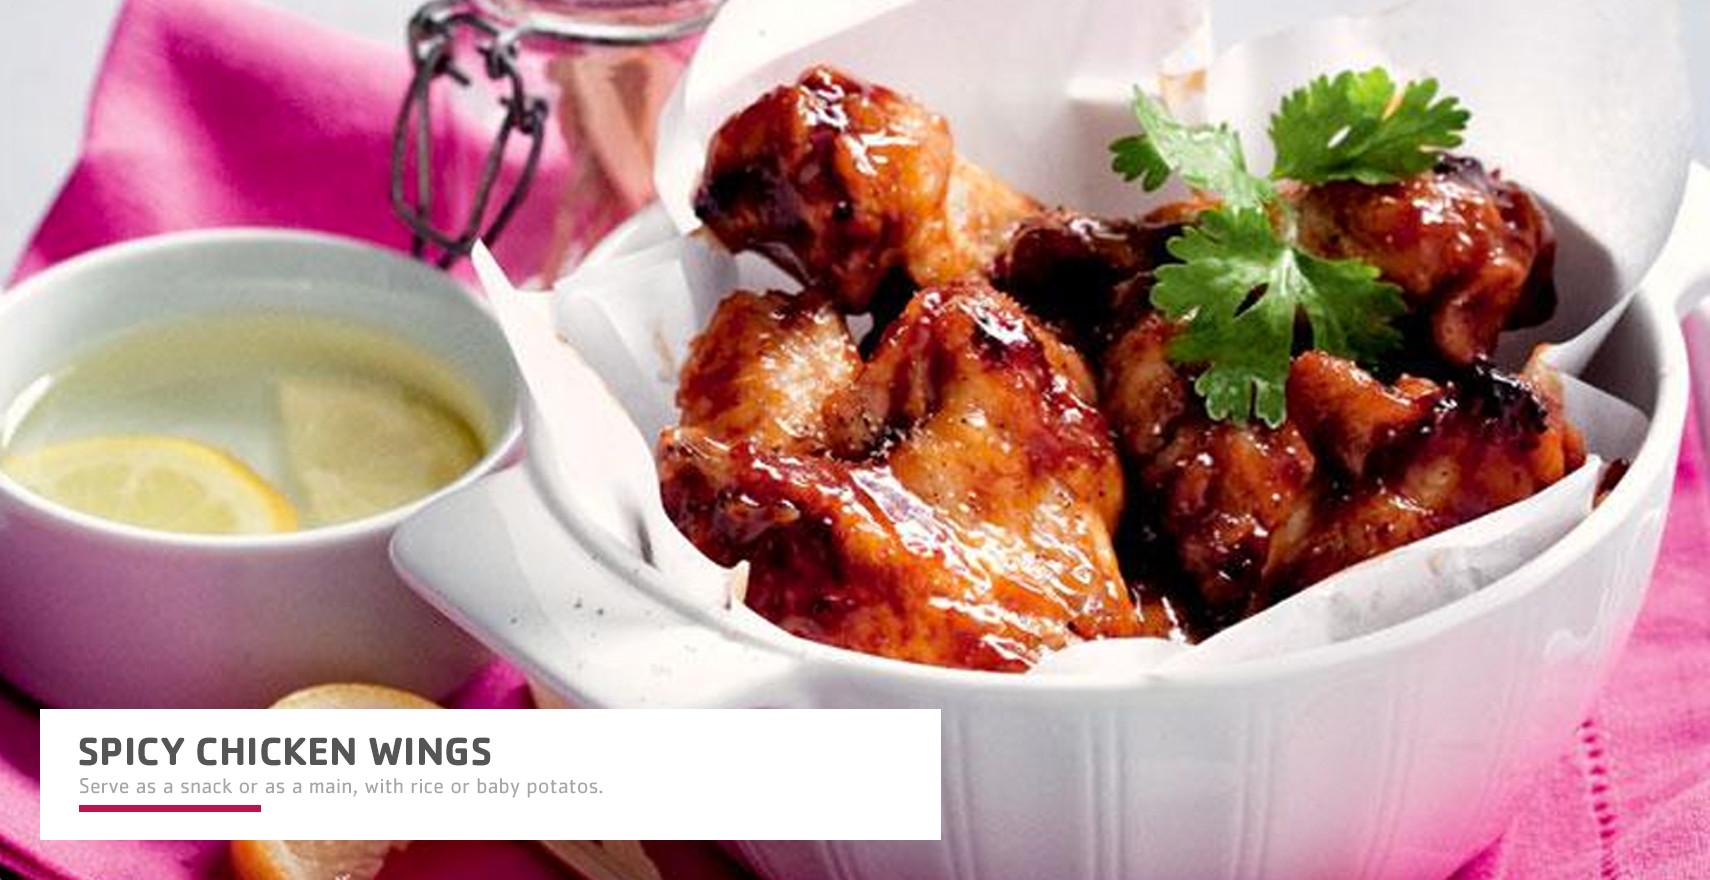 Spicy-Chicken-Wings.jpg